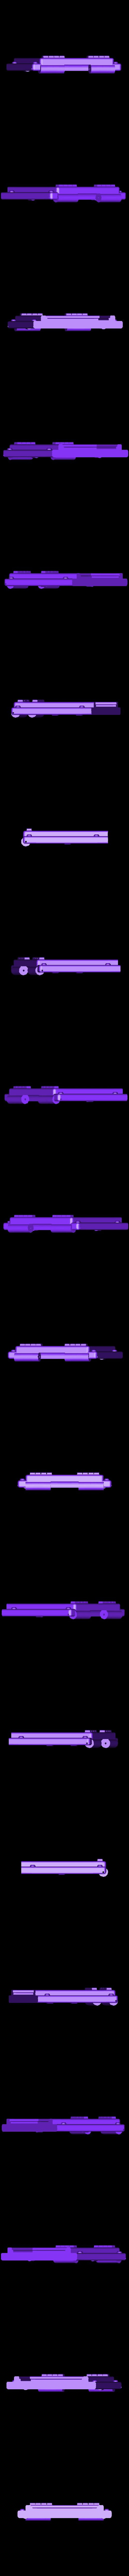 main_screen_1.stl Download free STL file ORCA communicator (Godzilla) • 3D printing object, poblocki1982